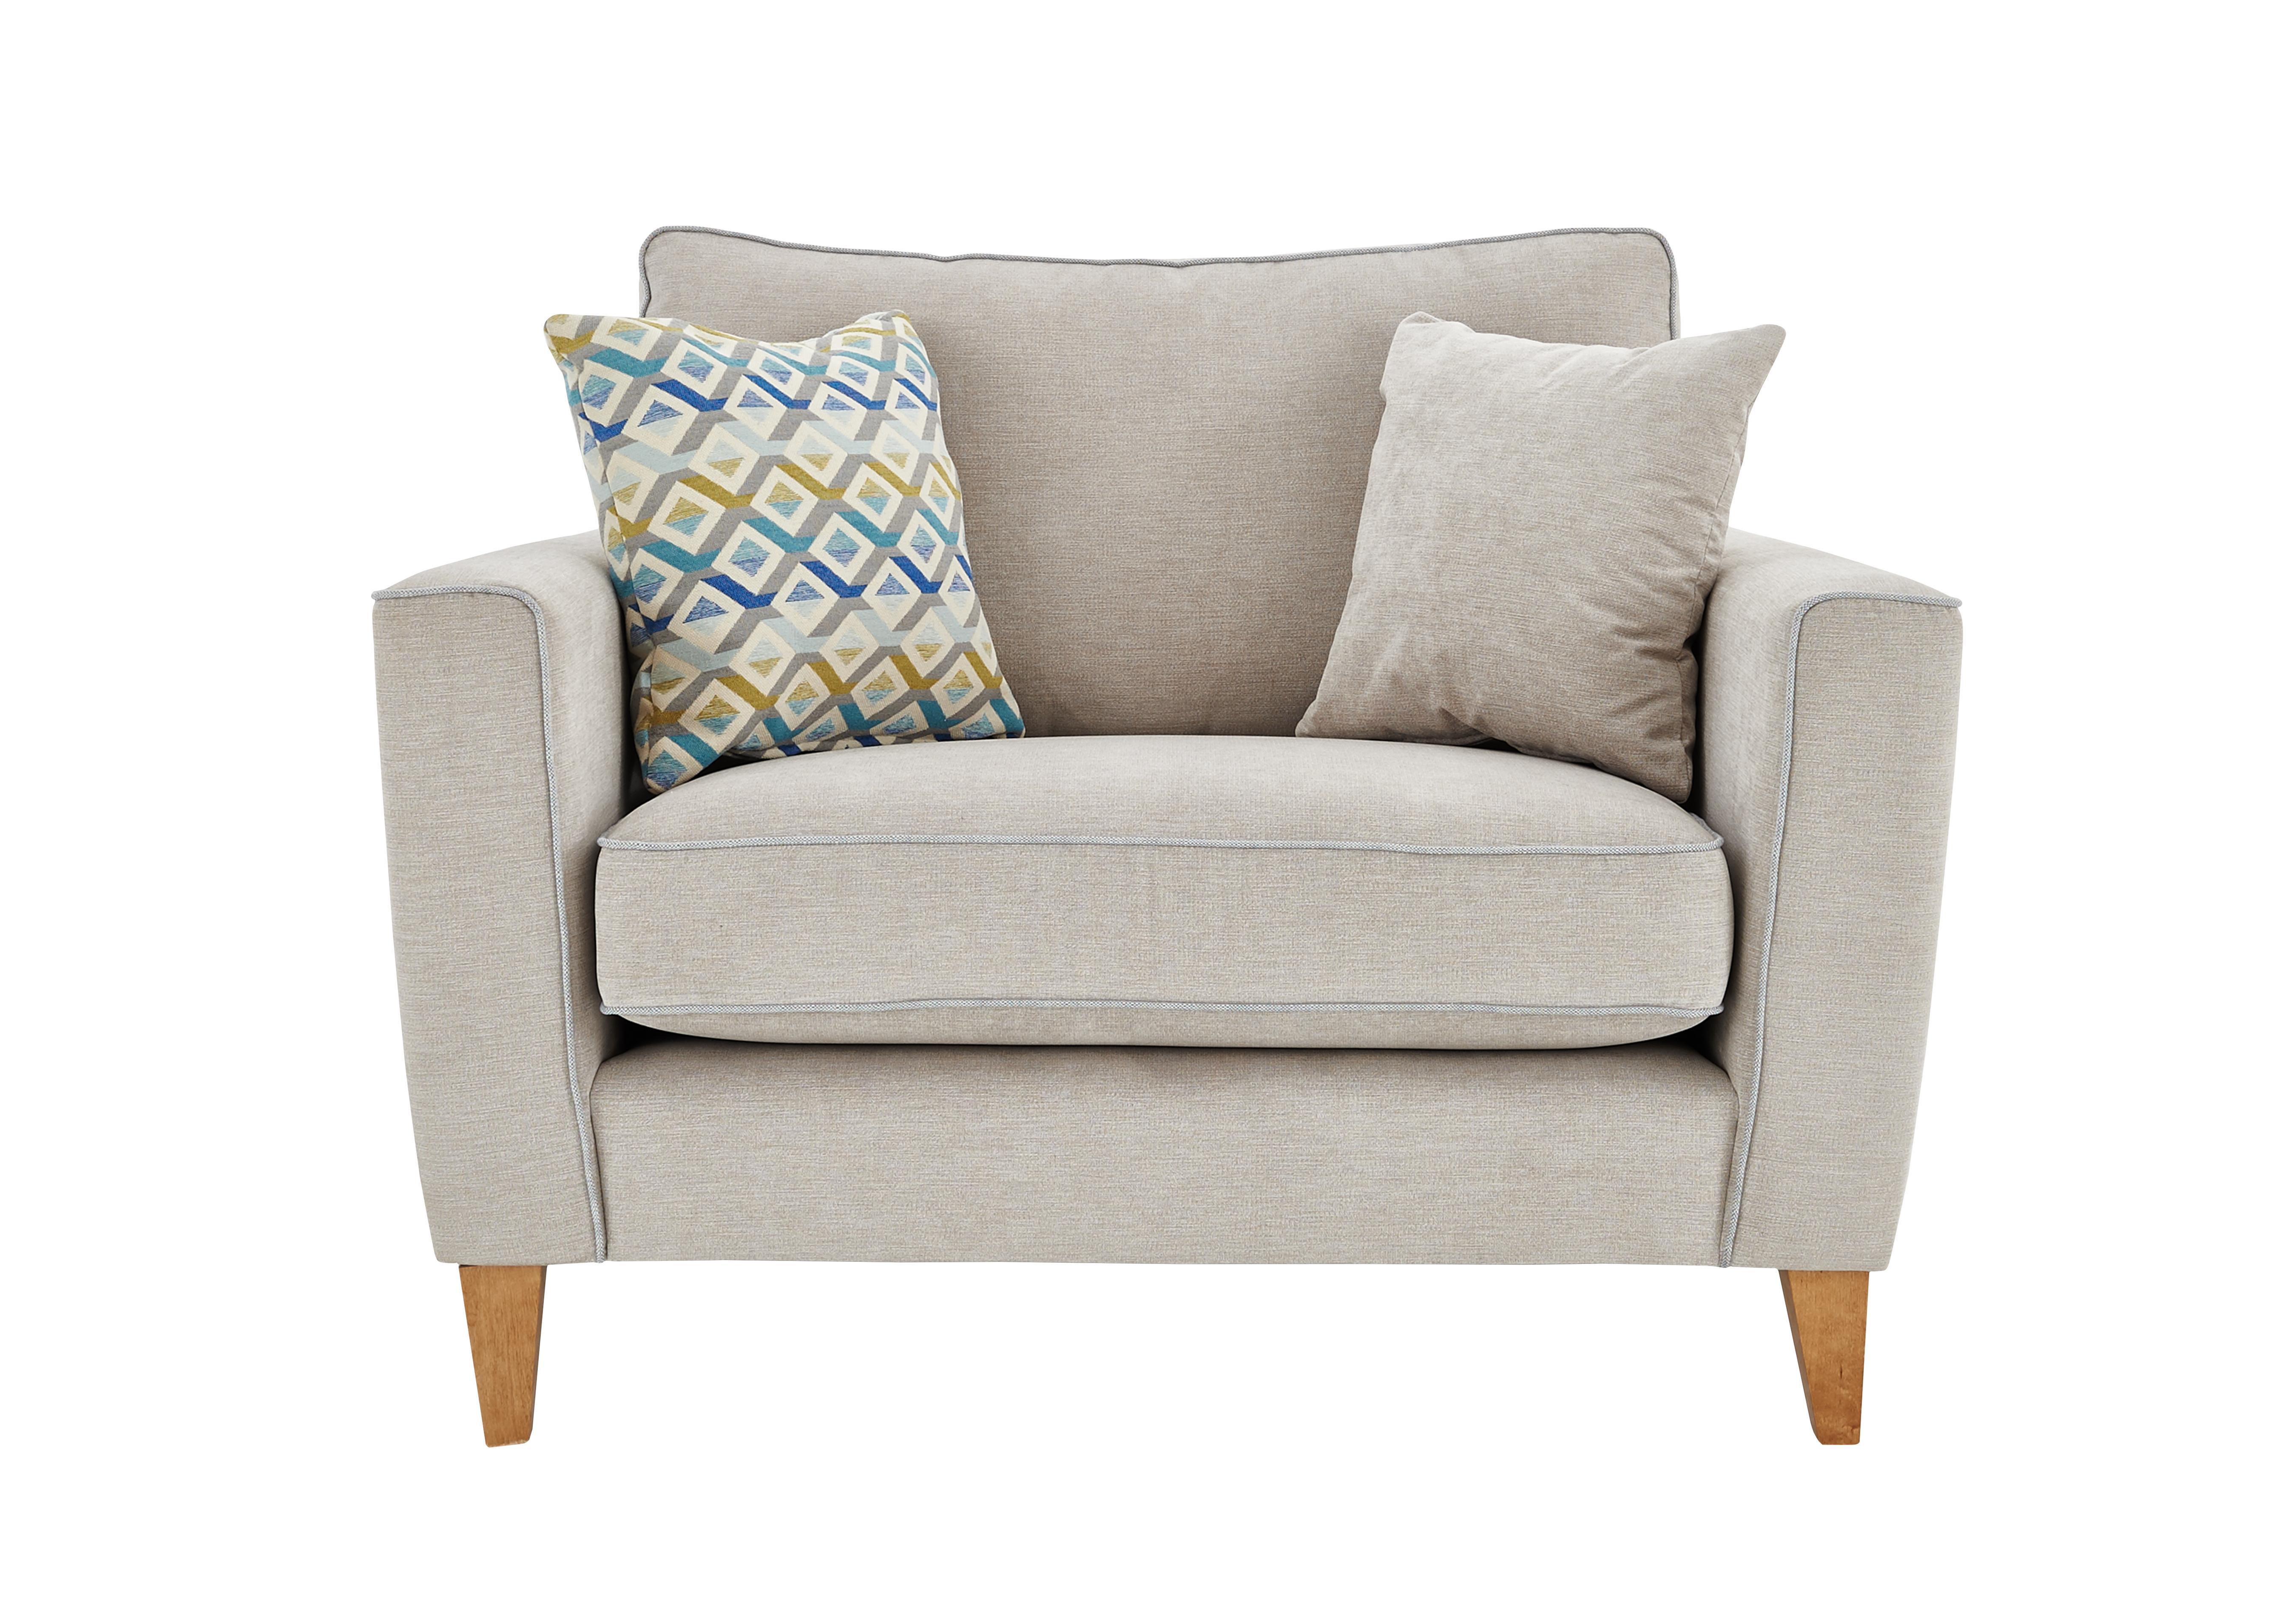 Attirant Copenhagen Fabric Snuggler Armchair